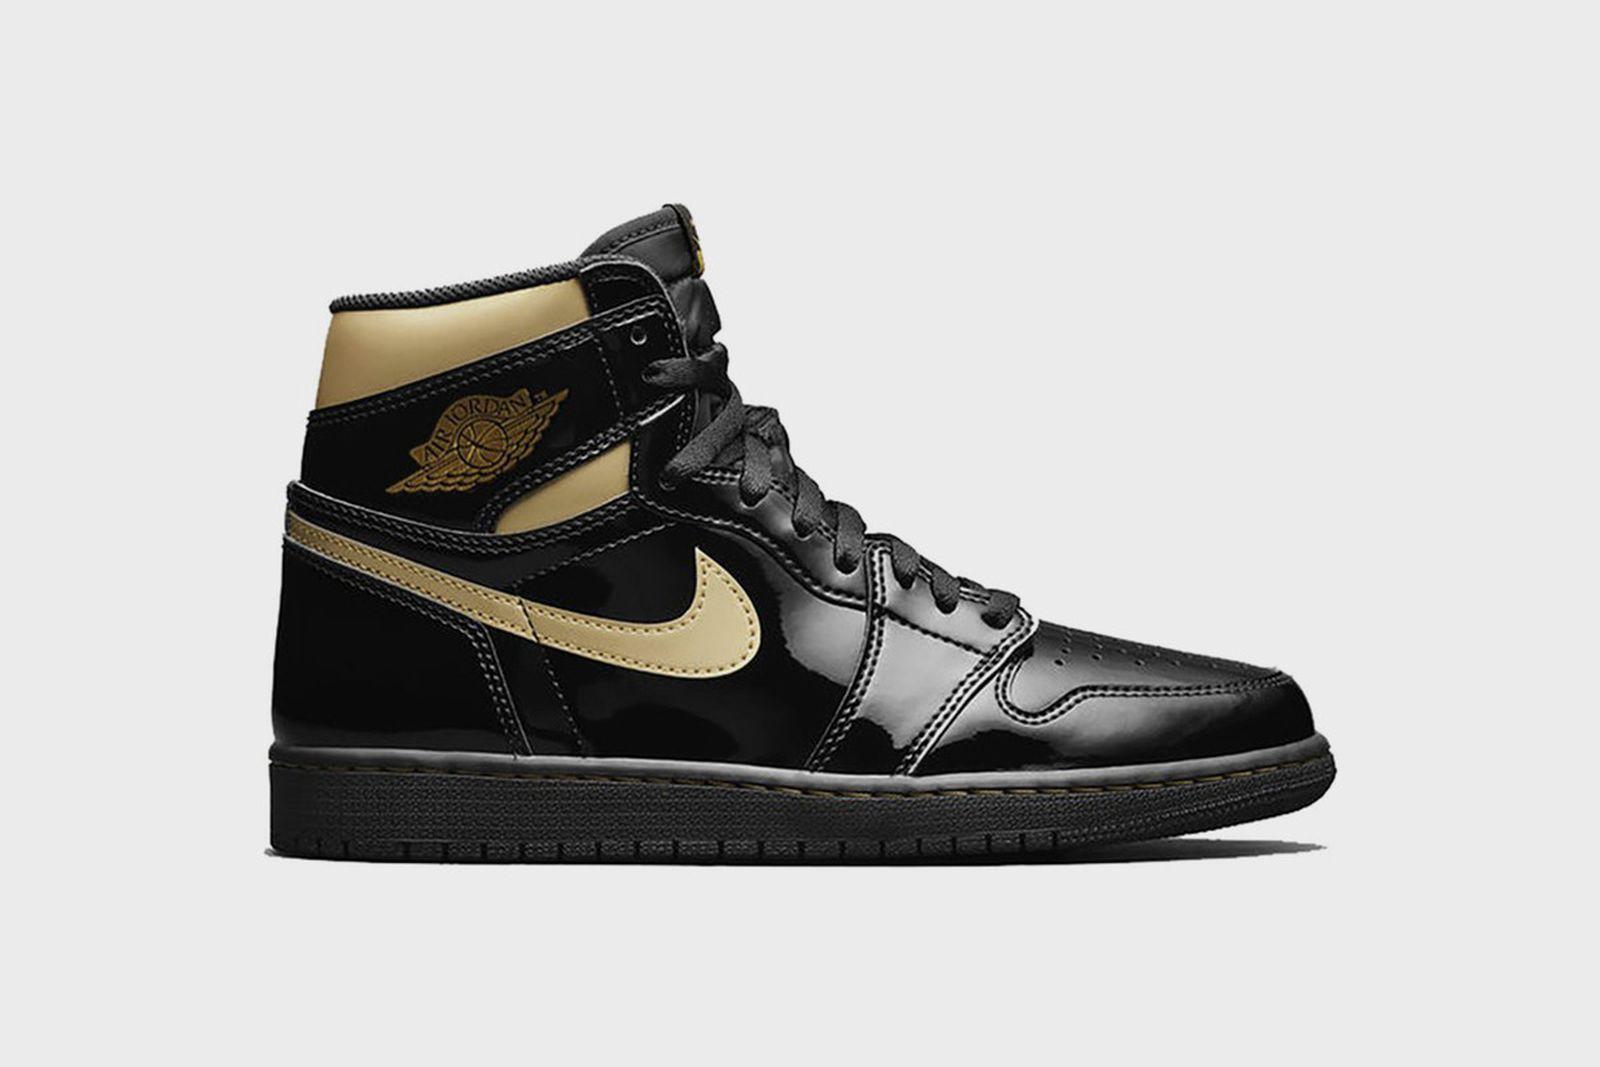 Nike Air Jordan 1 Black Gold: Where to Buy Now